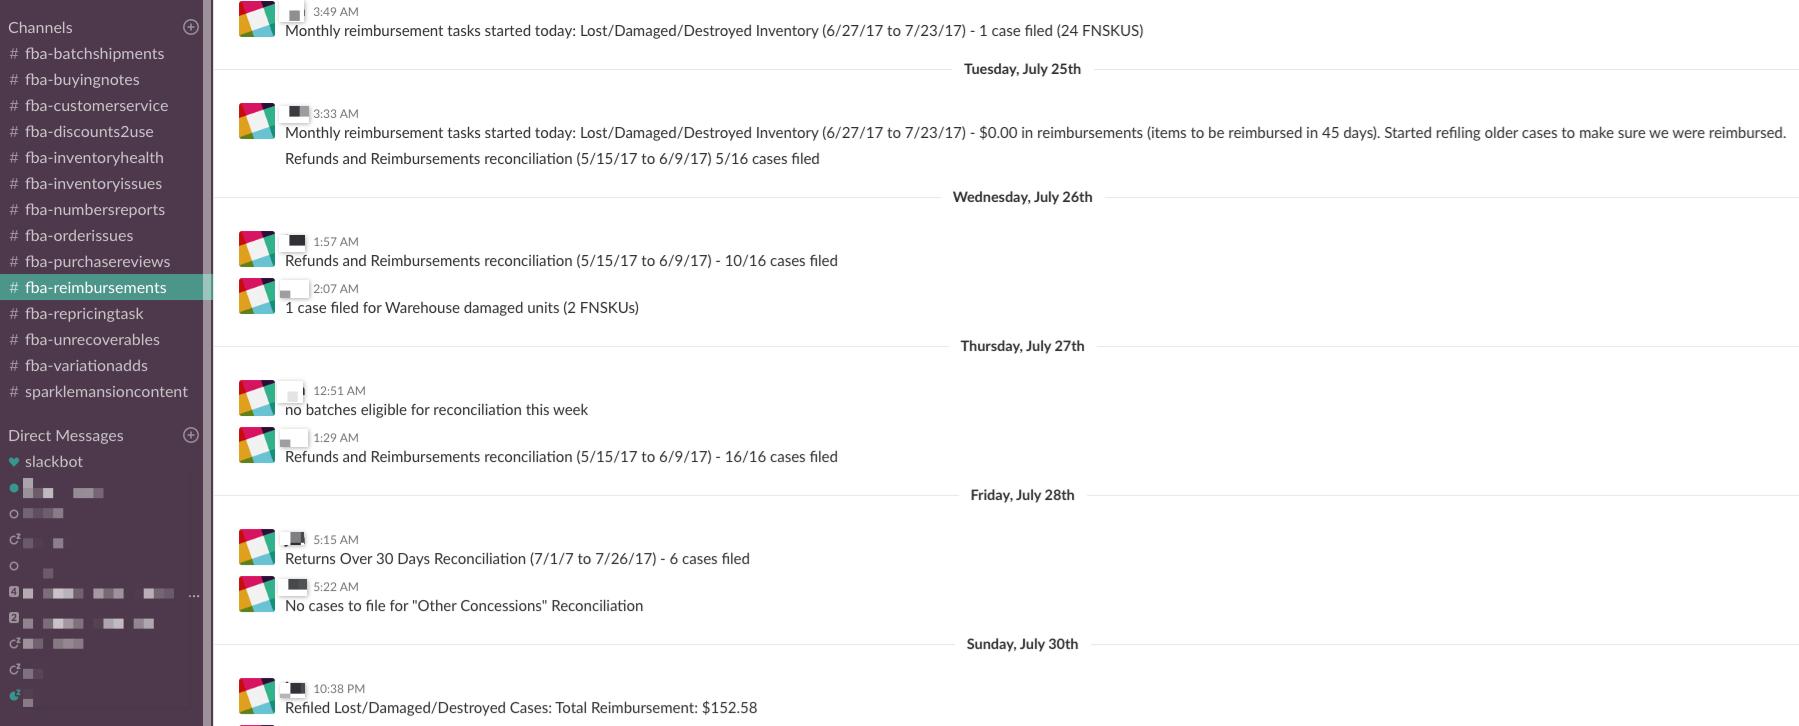 Slack Channel #fba-reimbursements - Online Arbitrage - Sellerspaceship.com